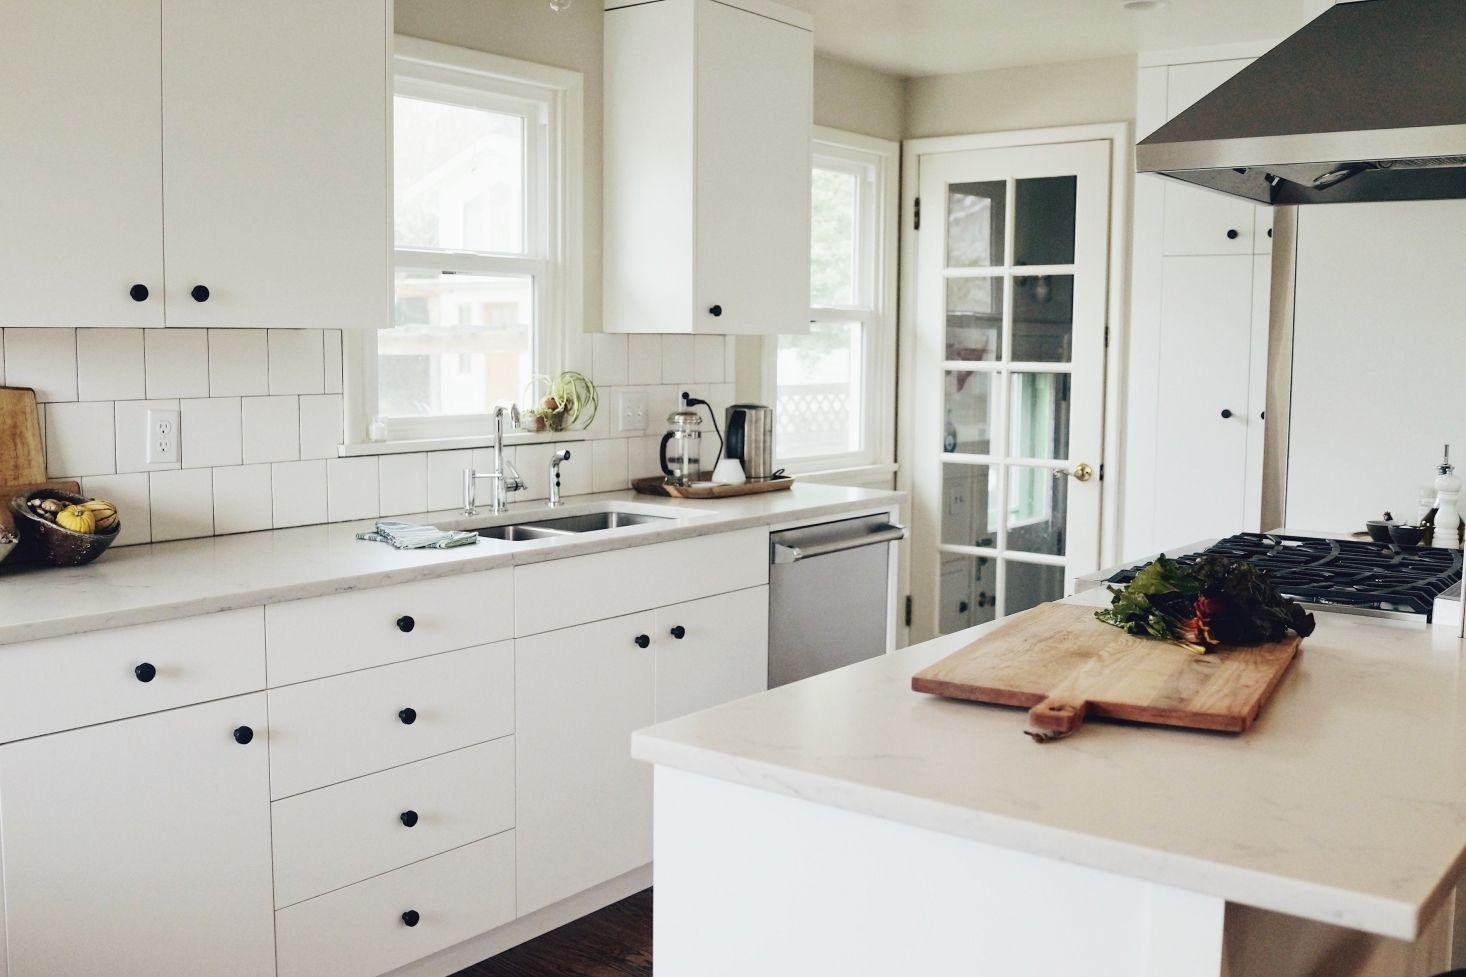 Kitchen Of The Week A Family Kitchen In Seattle Budget Edition Remodelista Home Kitchens Kitchen Decor Kitchen